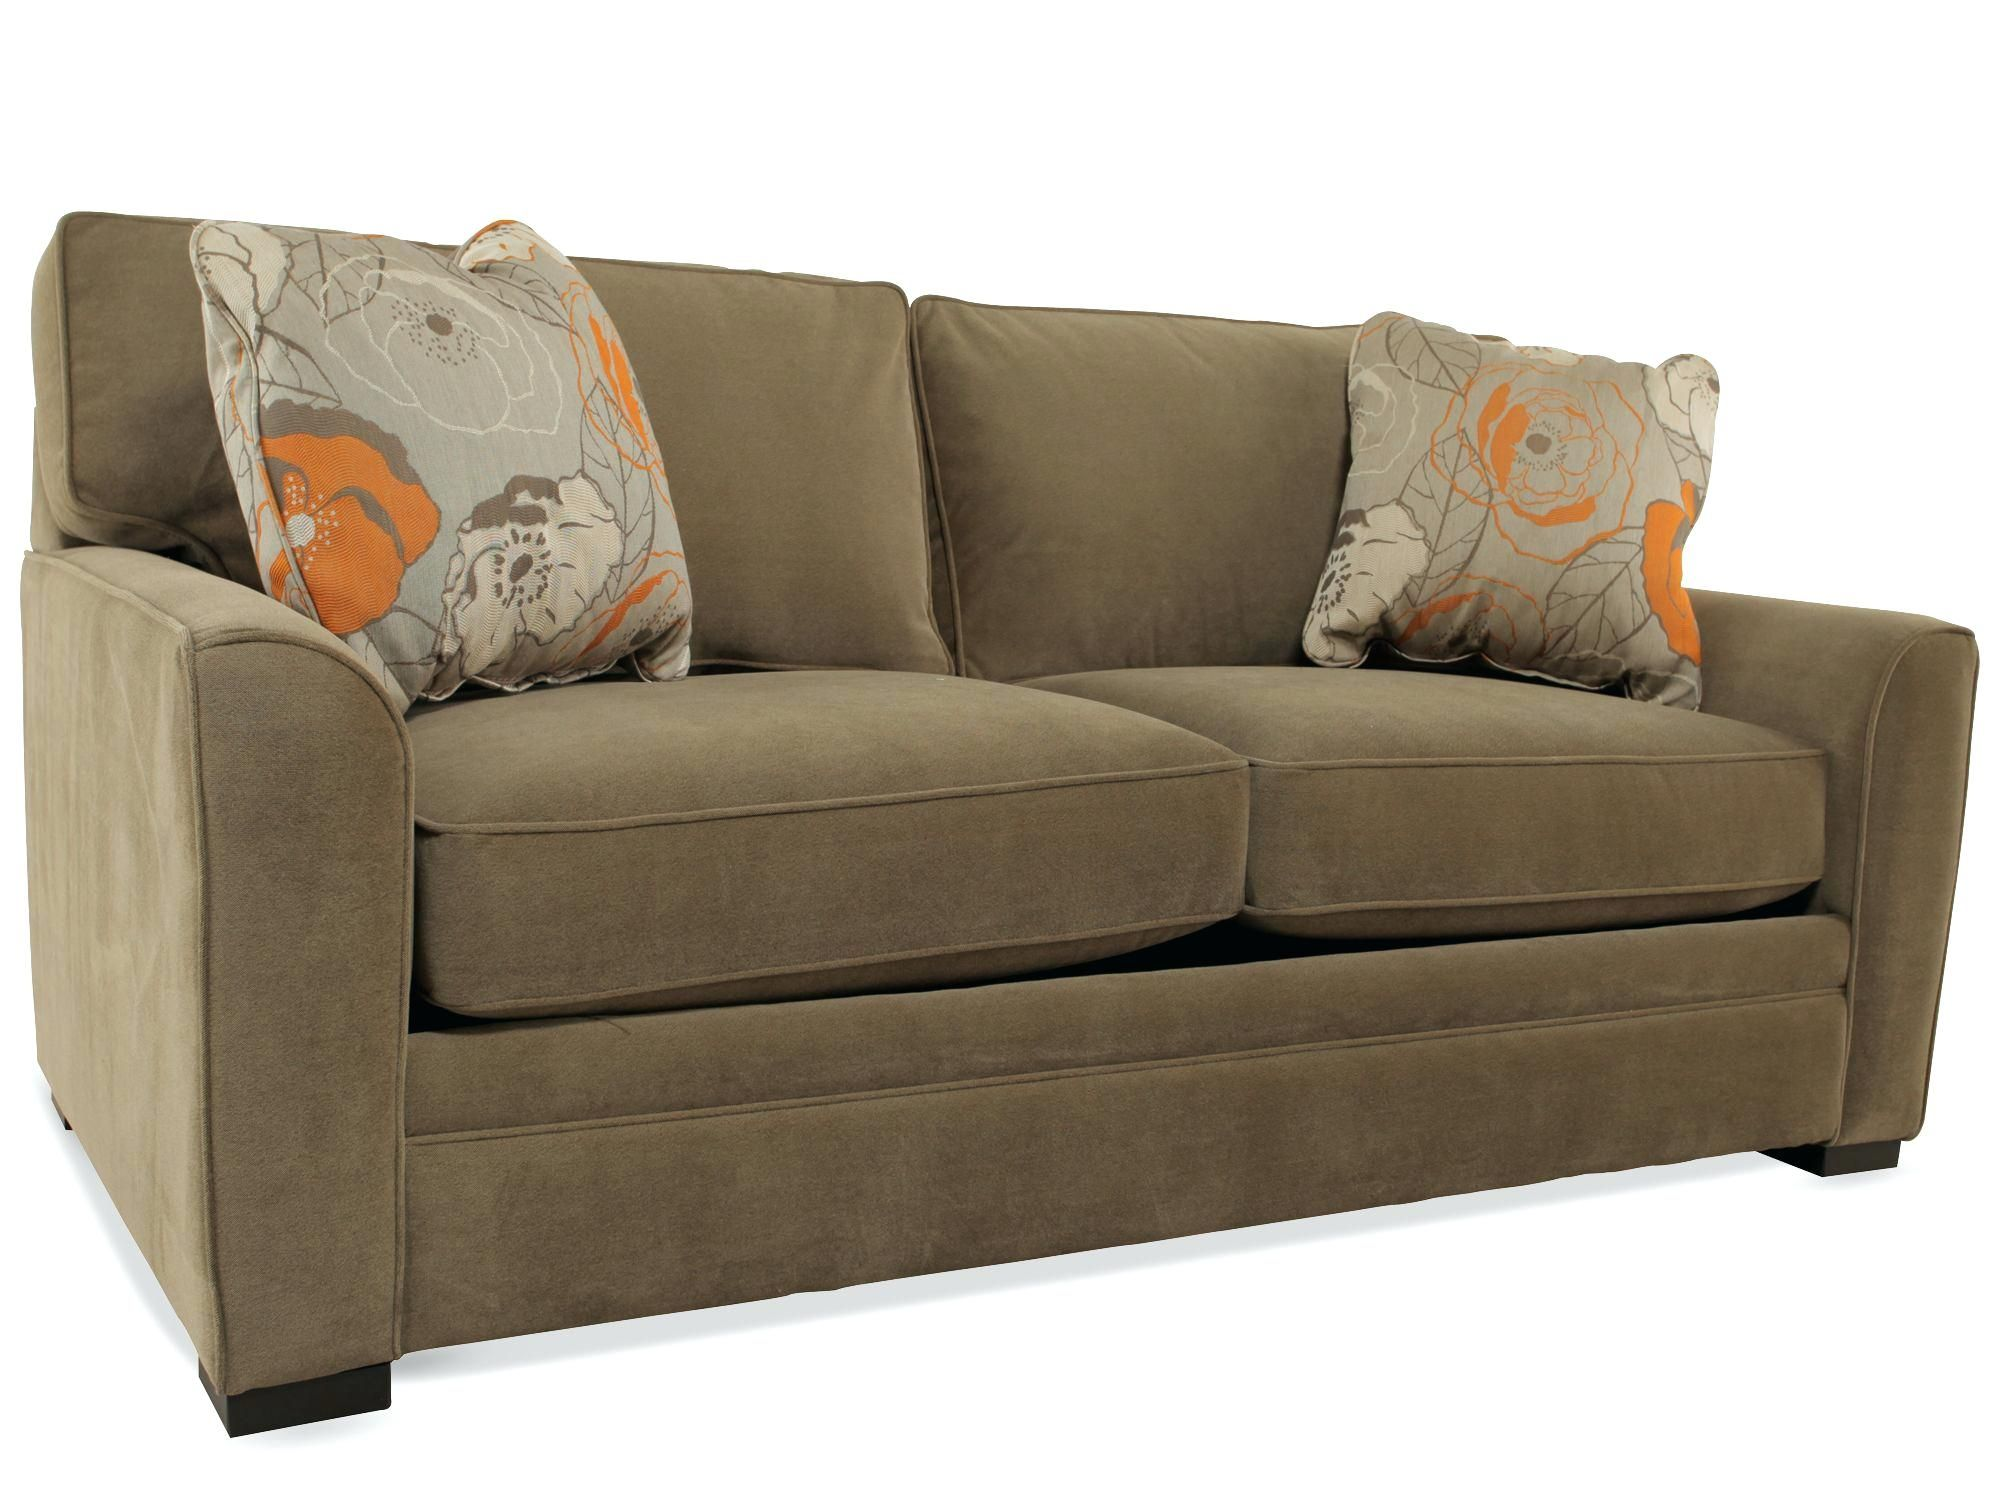 Sleeper Sofa Sheet Size